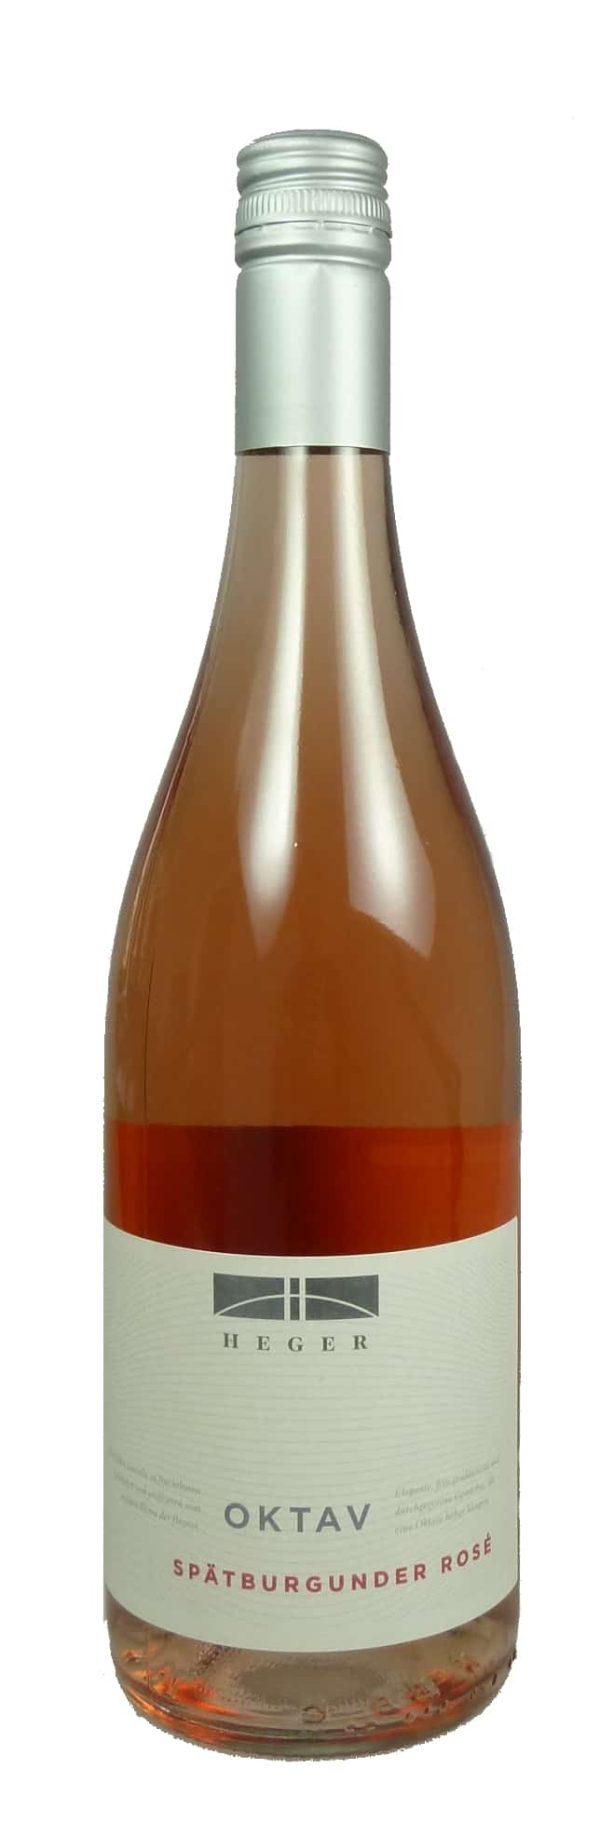 Oktav Spätburgunder Rosé Qualitätswein trocken 2016